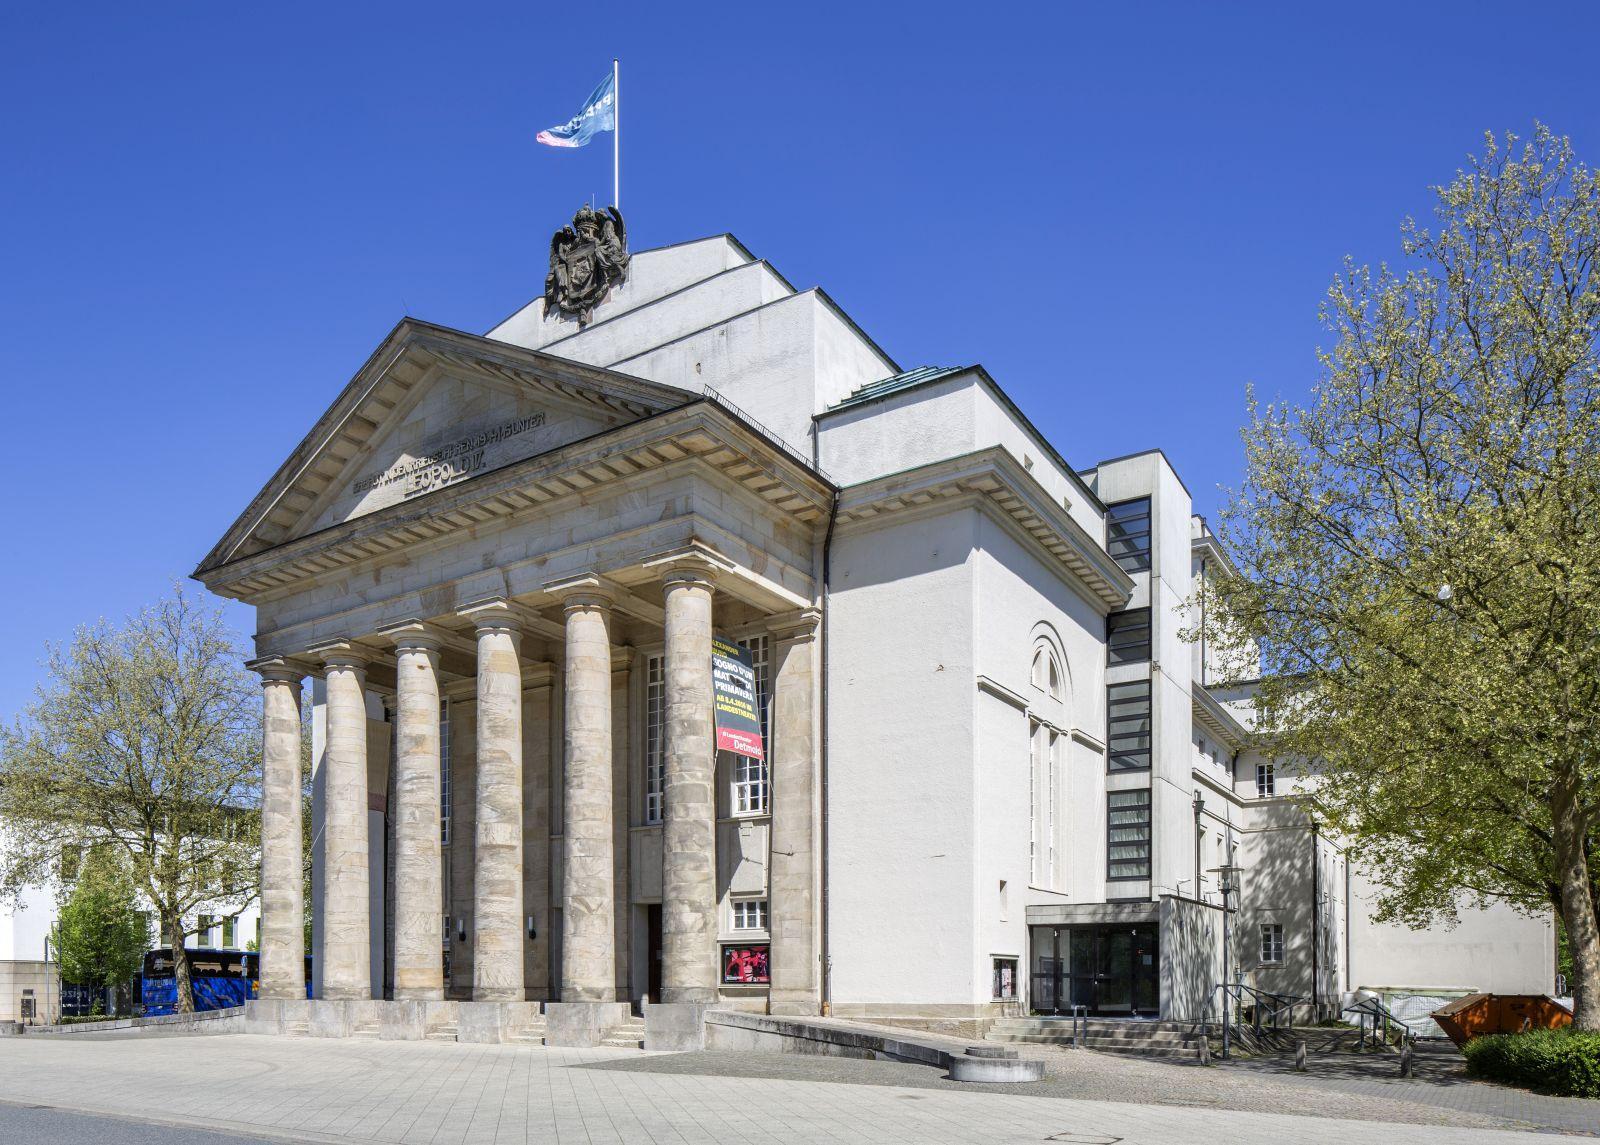 landestheater detmold detmold architektur baukunst nrw